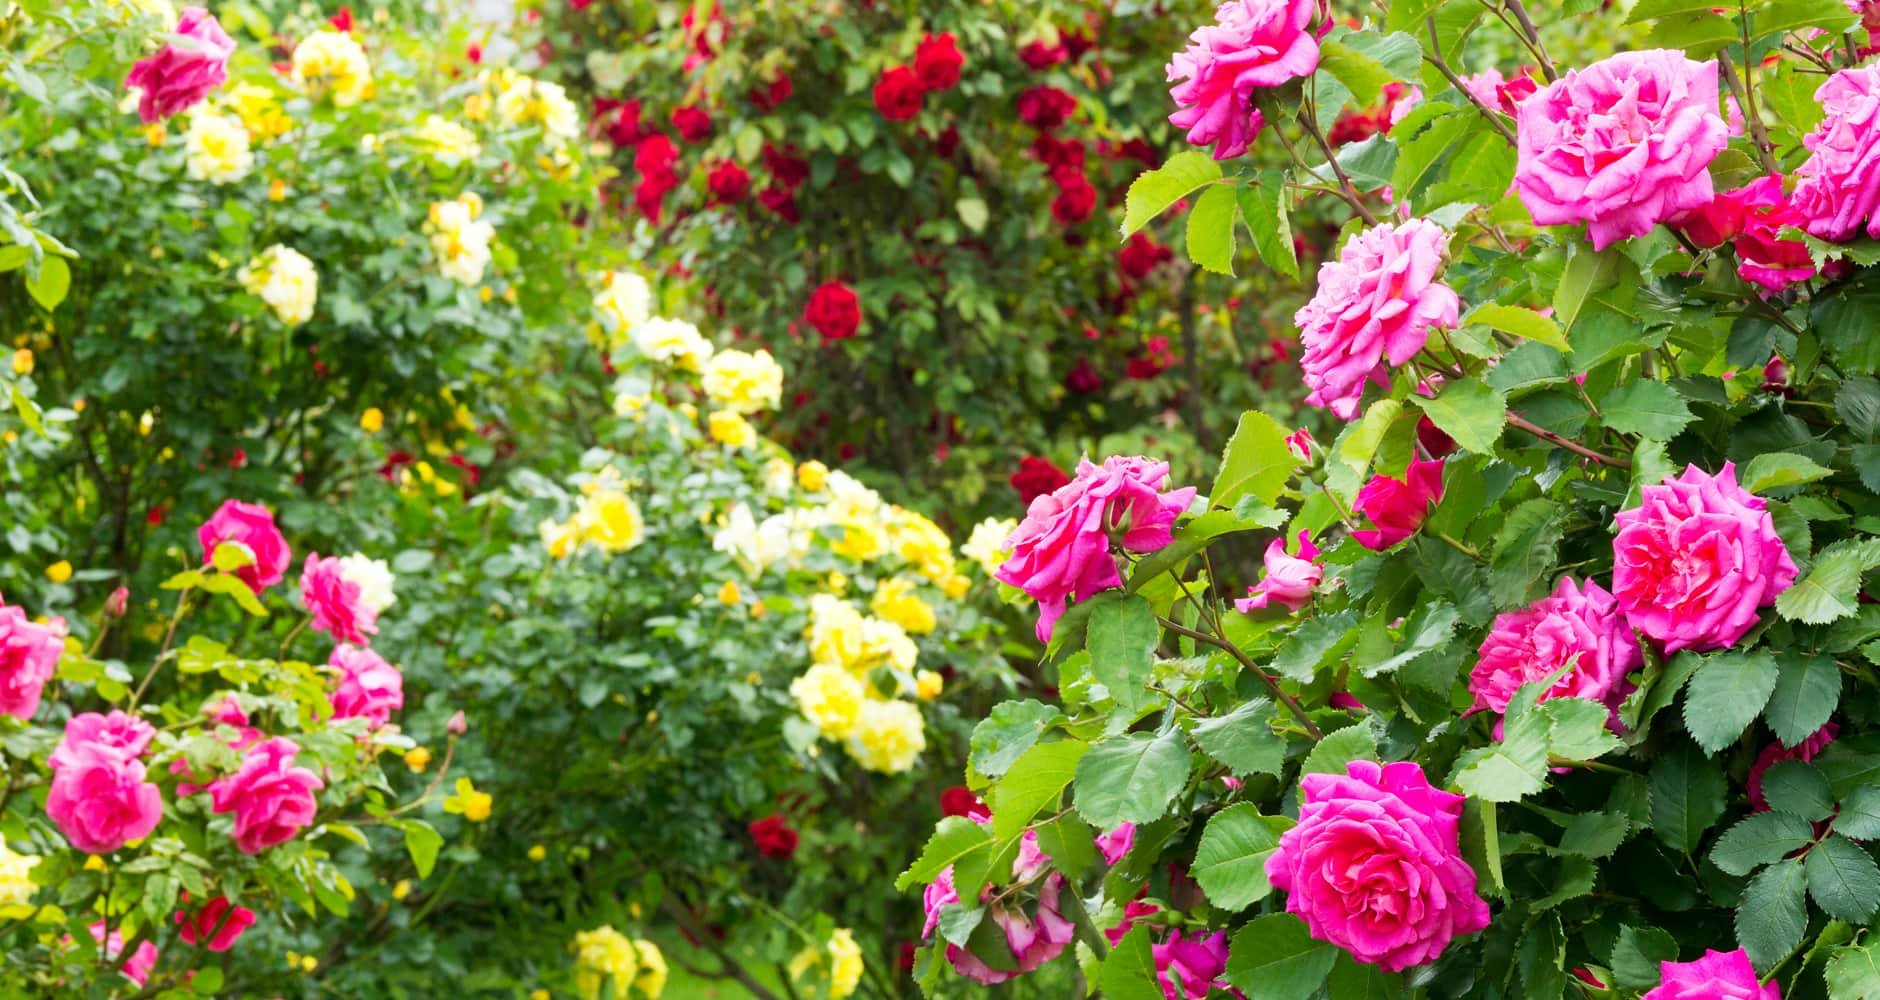 Edible flowers - roses